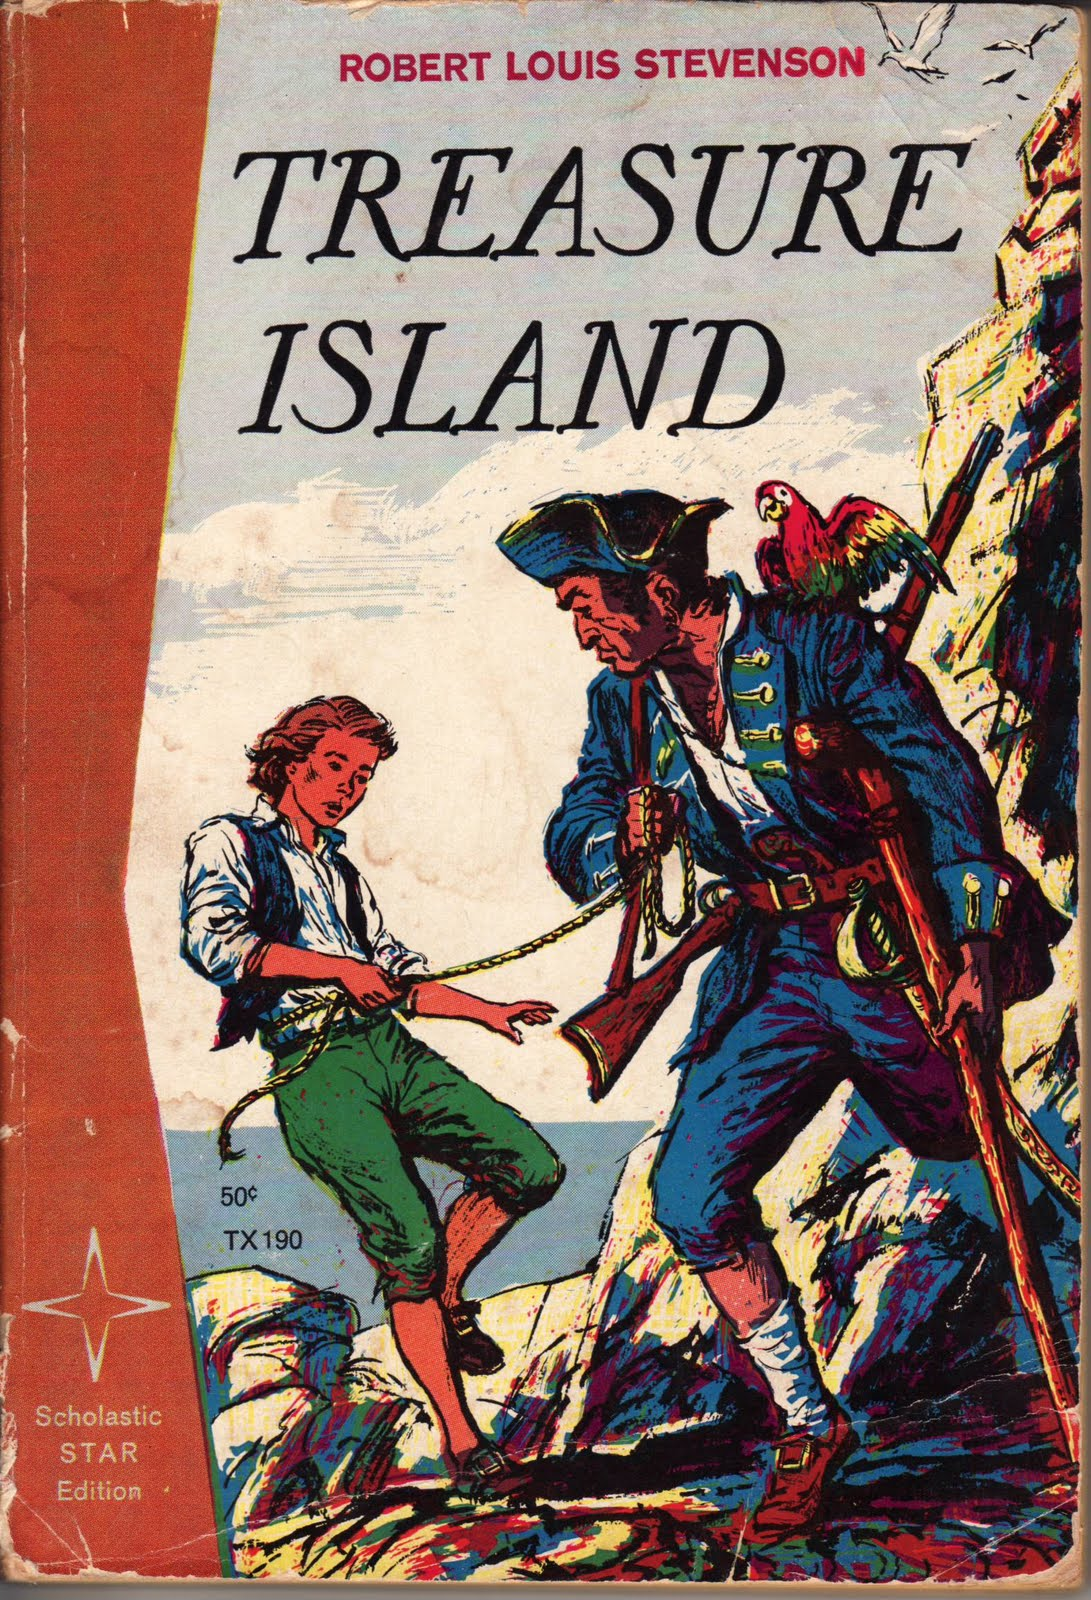 Jan 02, · Treasure Island - TI Hotel & Casino: $50 late check out fee - See 15, traveler reviews, 5, candid photos, and great deals for Treasure Island - TI Hotel & Casino at TripAdvisor.2/5.